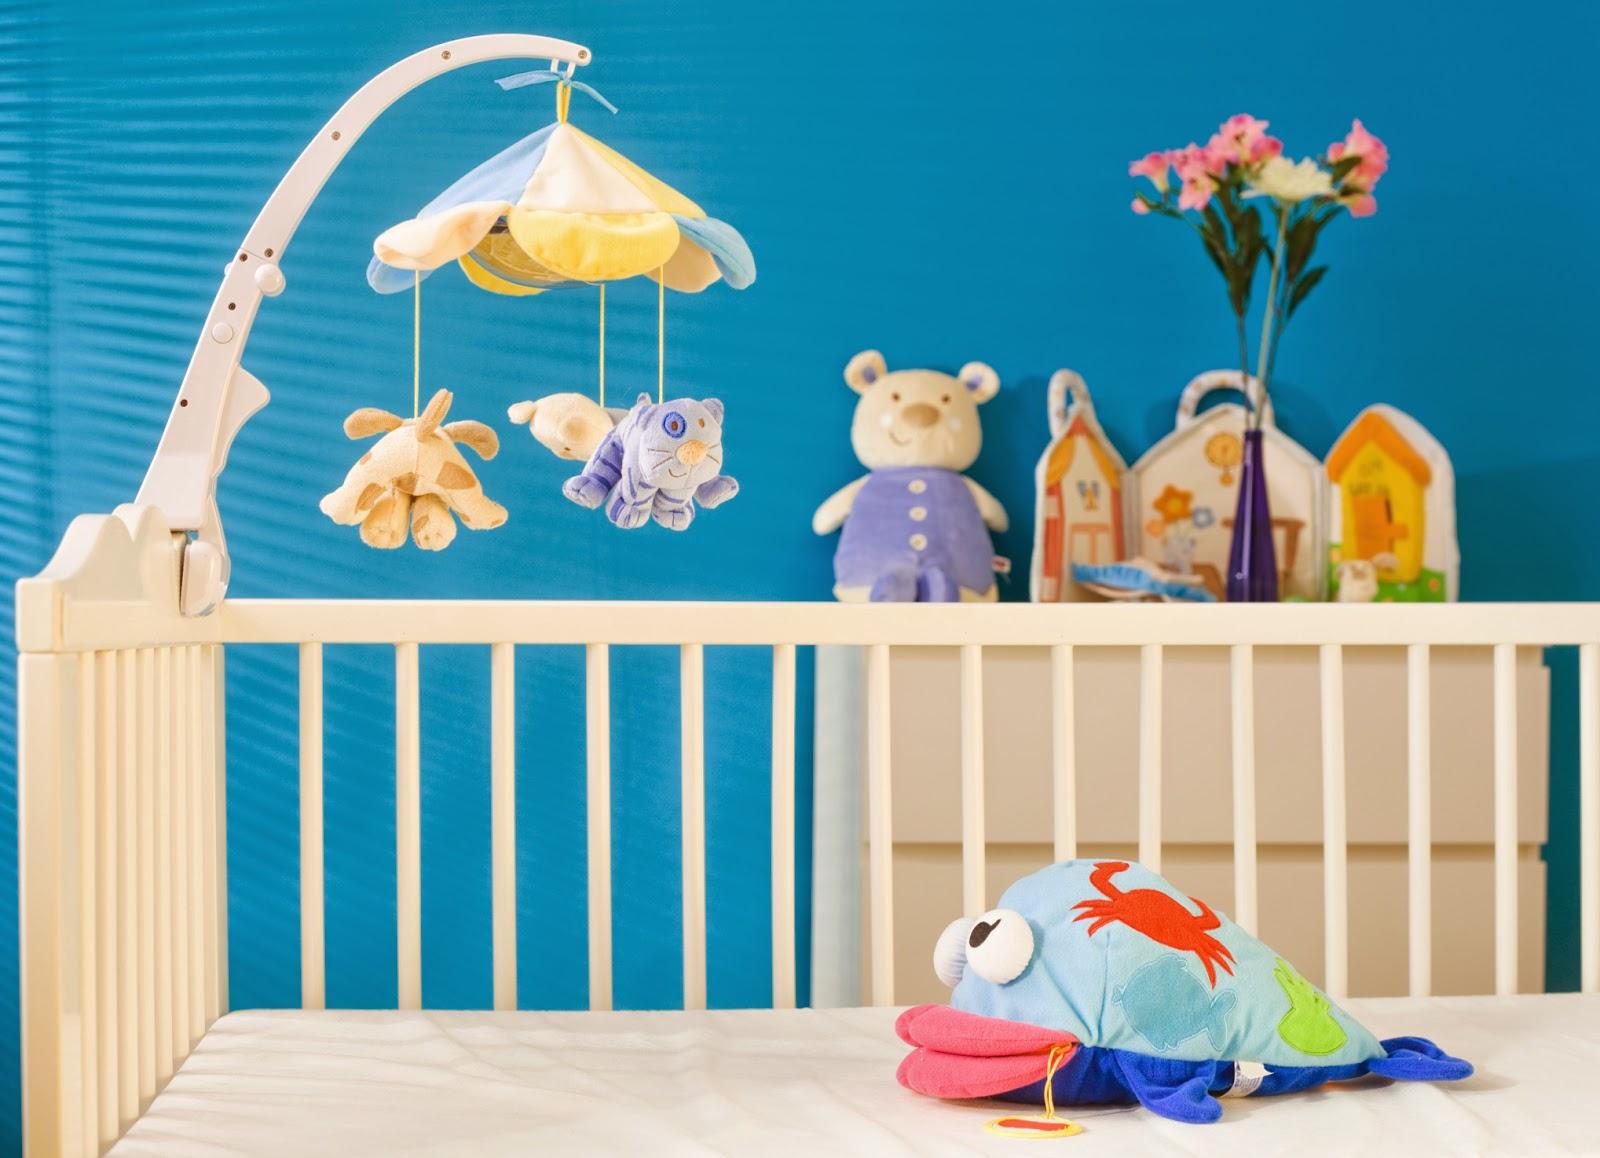 Petipeti Habitaciones Para Bebes Decoraci N Para Cuartos De Beb S ~ Decoracion De Habitaciones Para Bebes